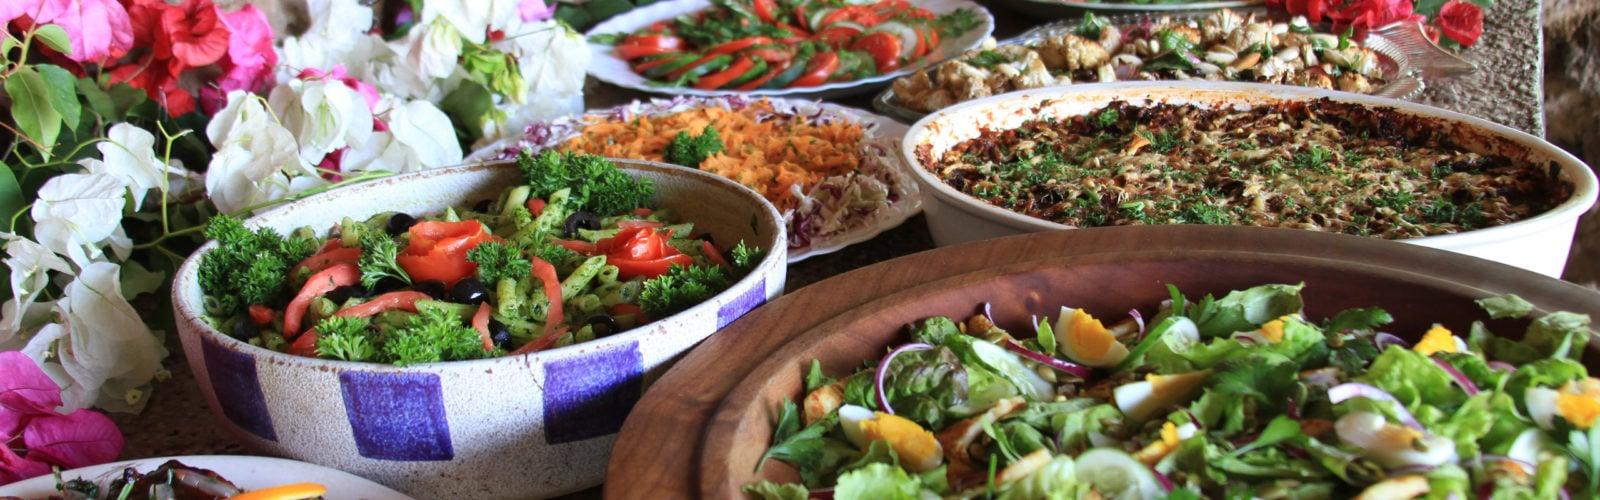 lewa-conservancies-lunch